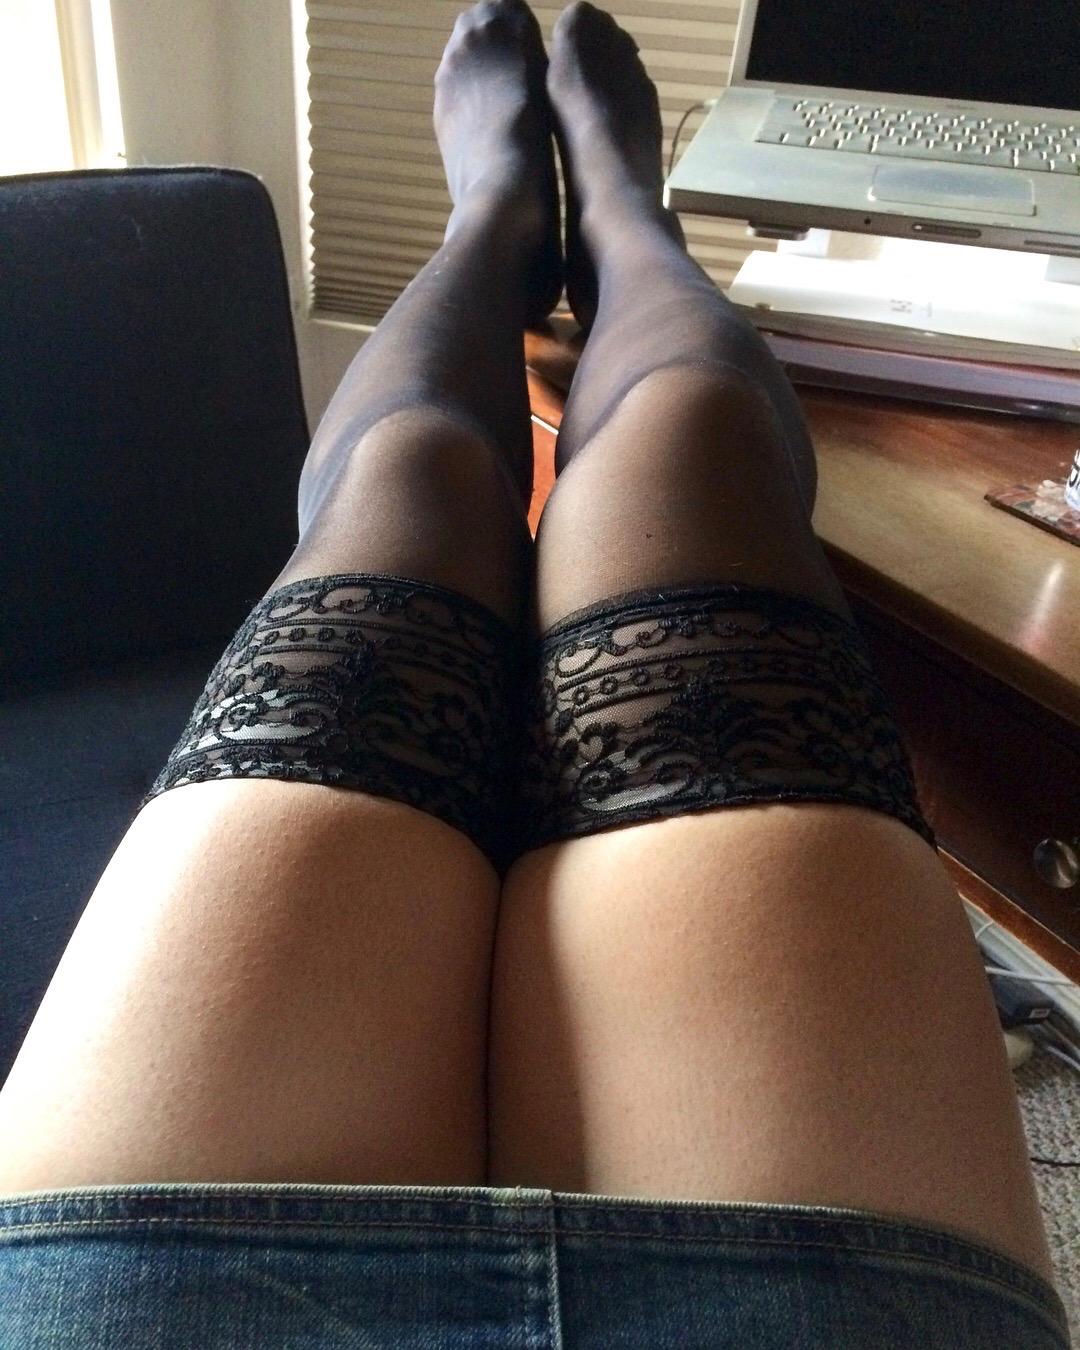 Think, erotic writting blogspot